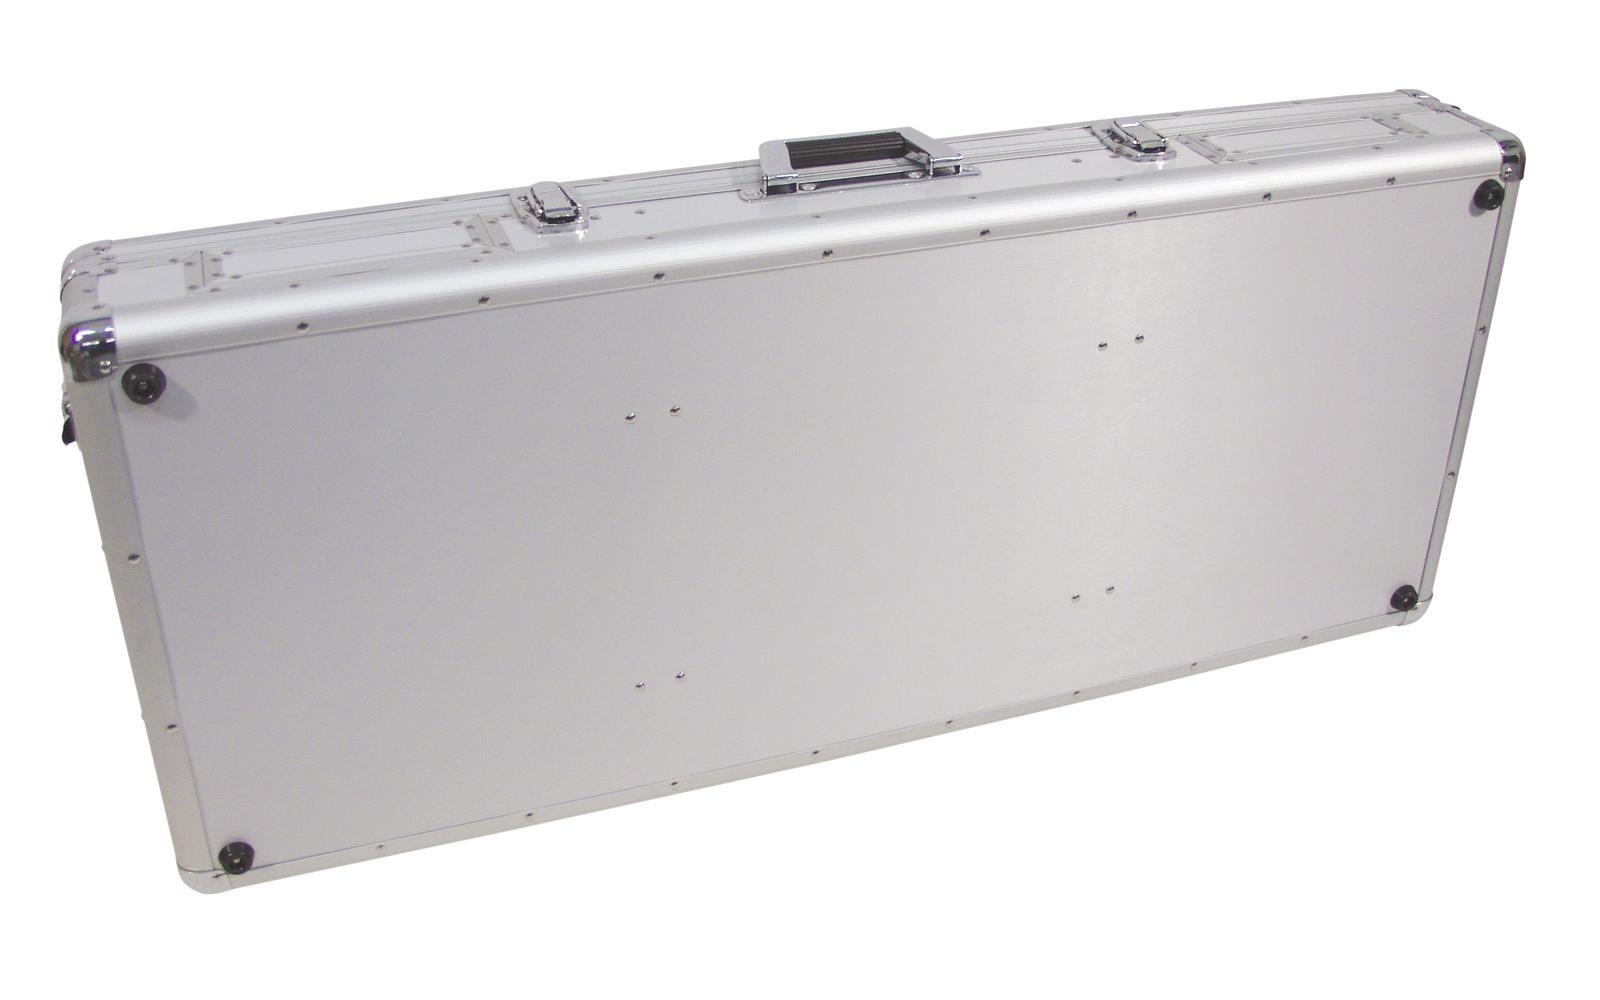 Flight Case Custodia Per Console Cdj Mixer Pc ROADINGER DIGI-2 2xCD/1xM-12 sil